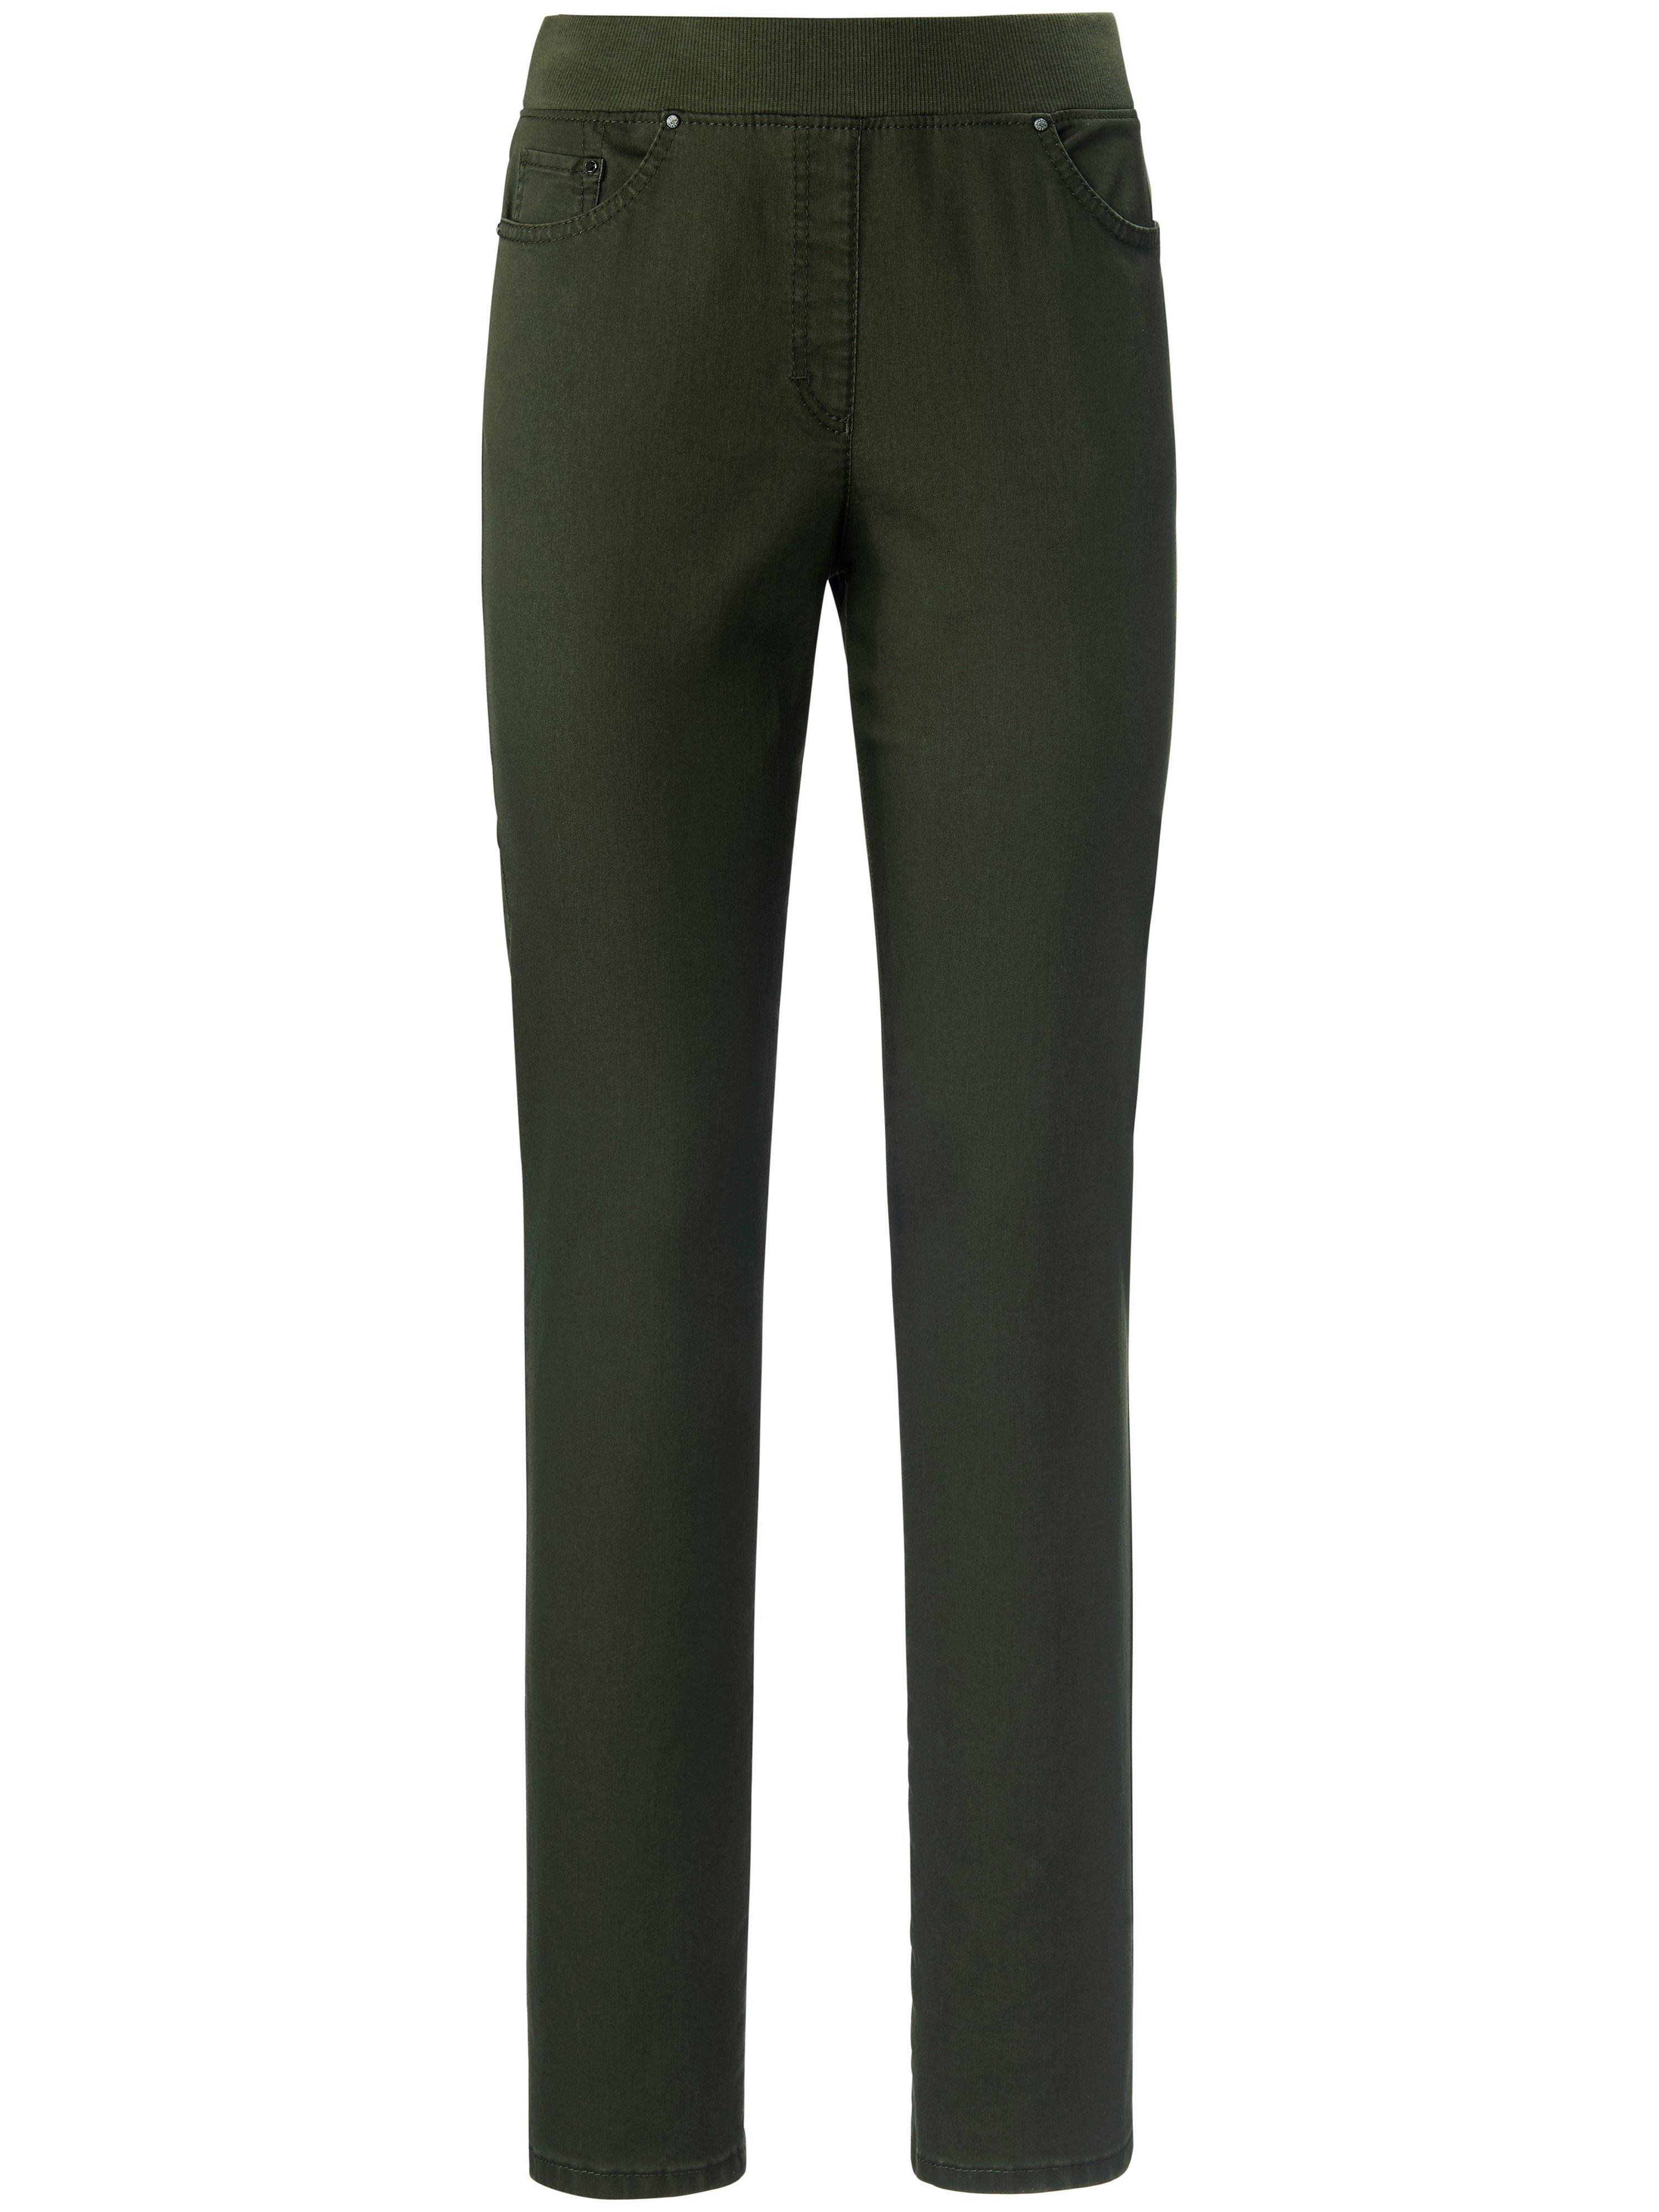 Comfort Plus-jeans model Carina Van Raphaela by Brax groen